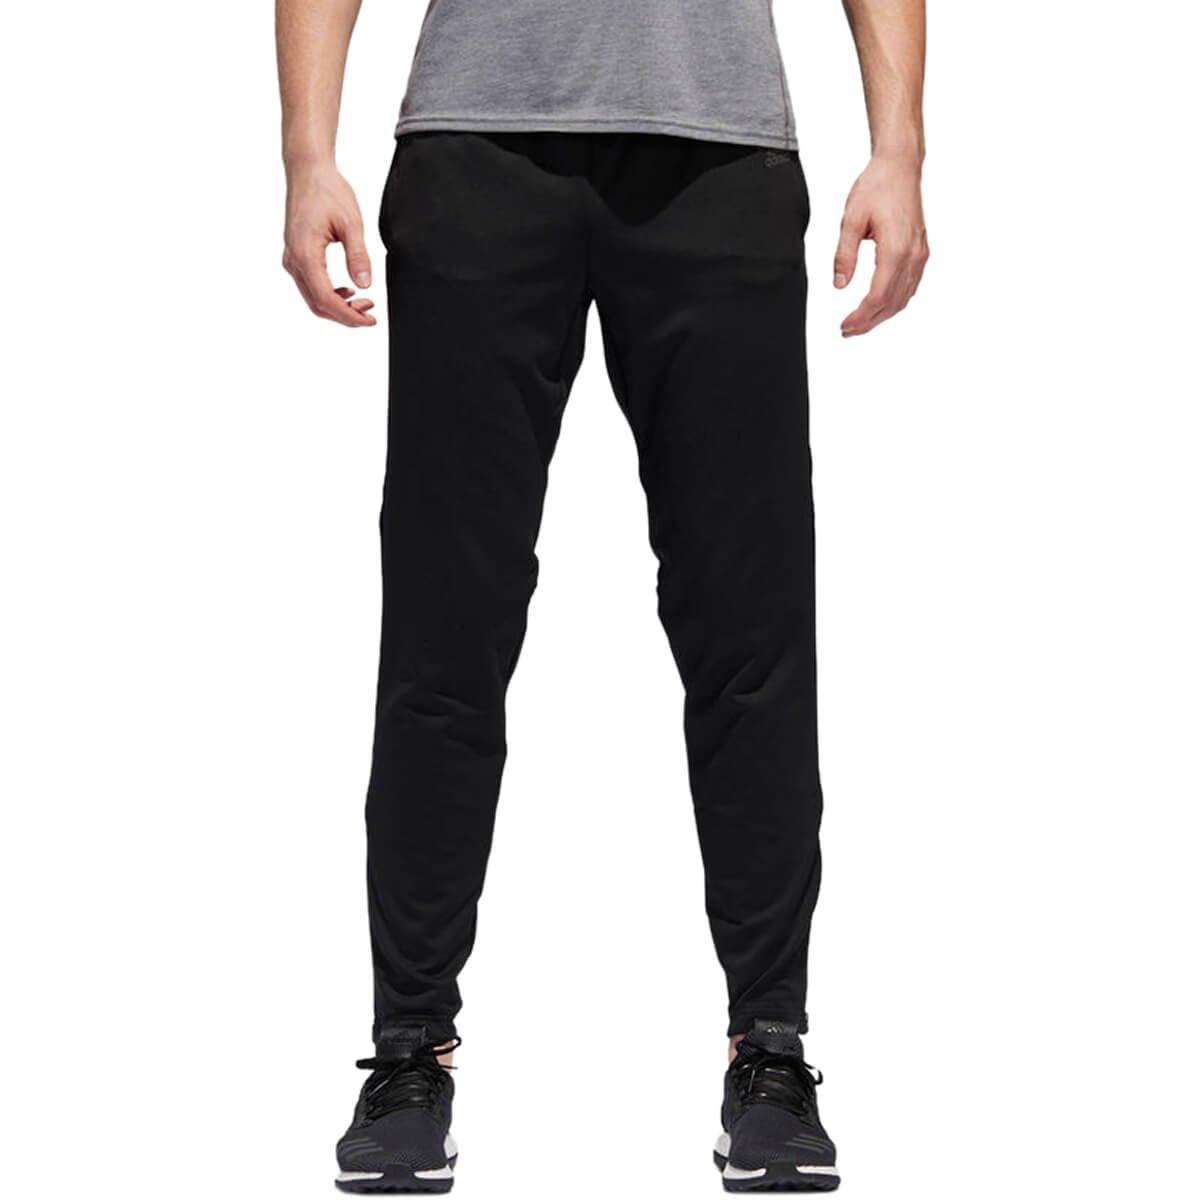 18f276b6b Bizz Store - Calça Masculina Adidas Response Astro